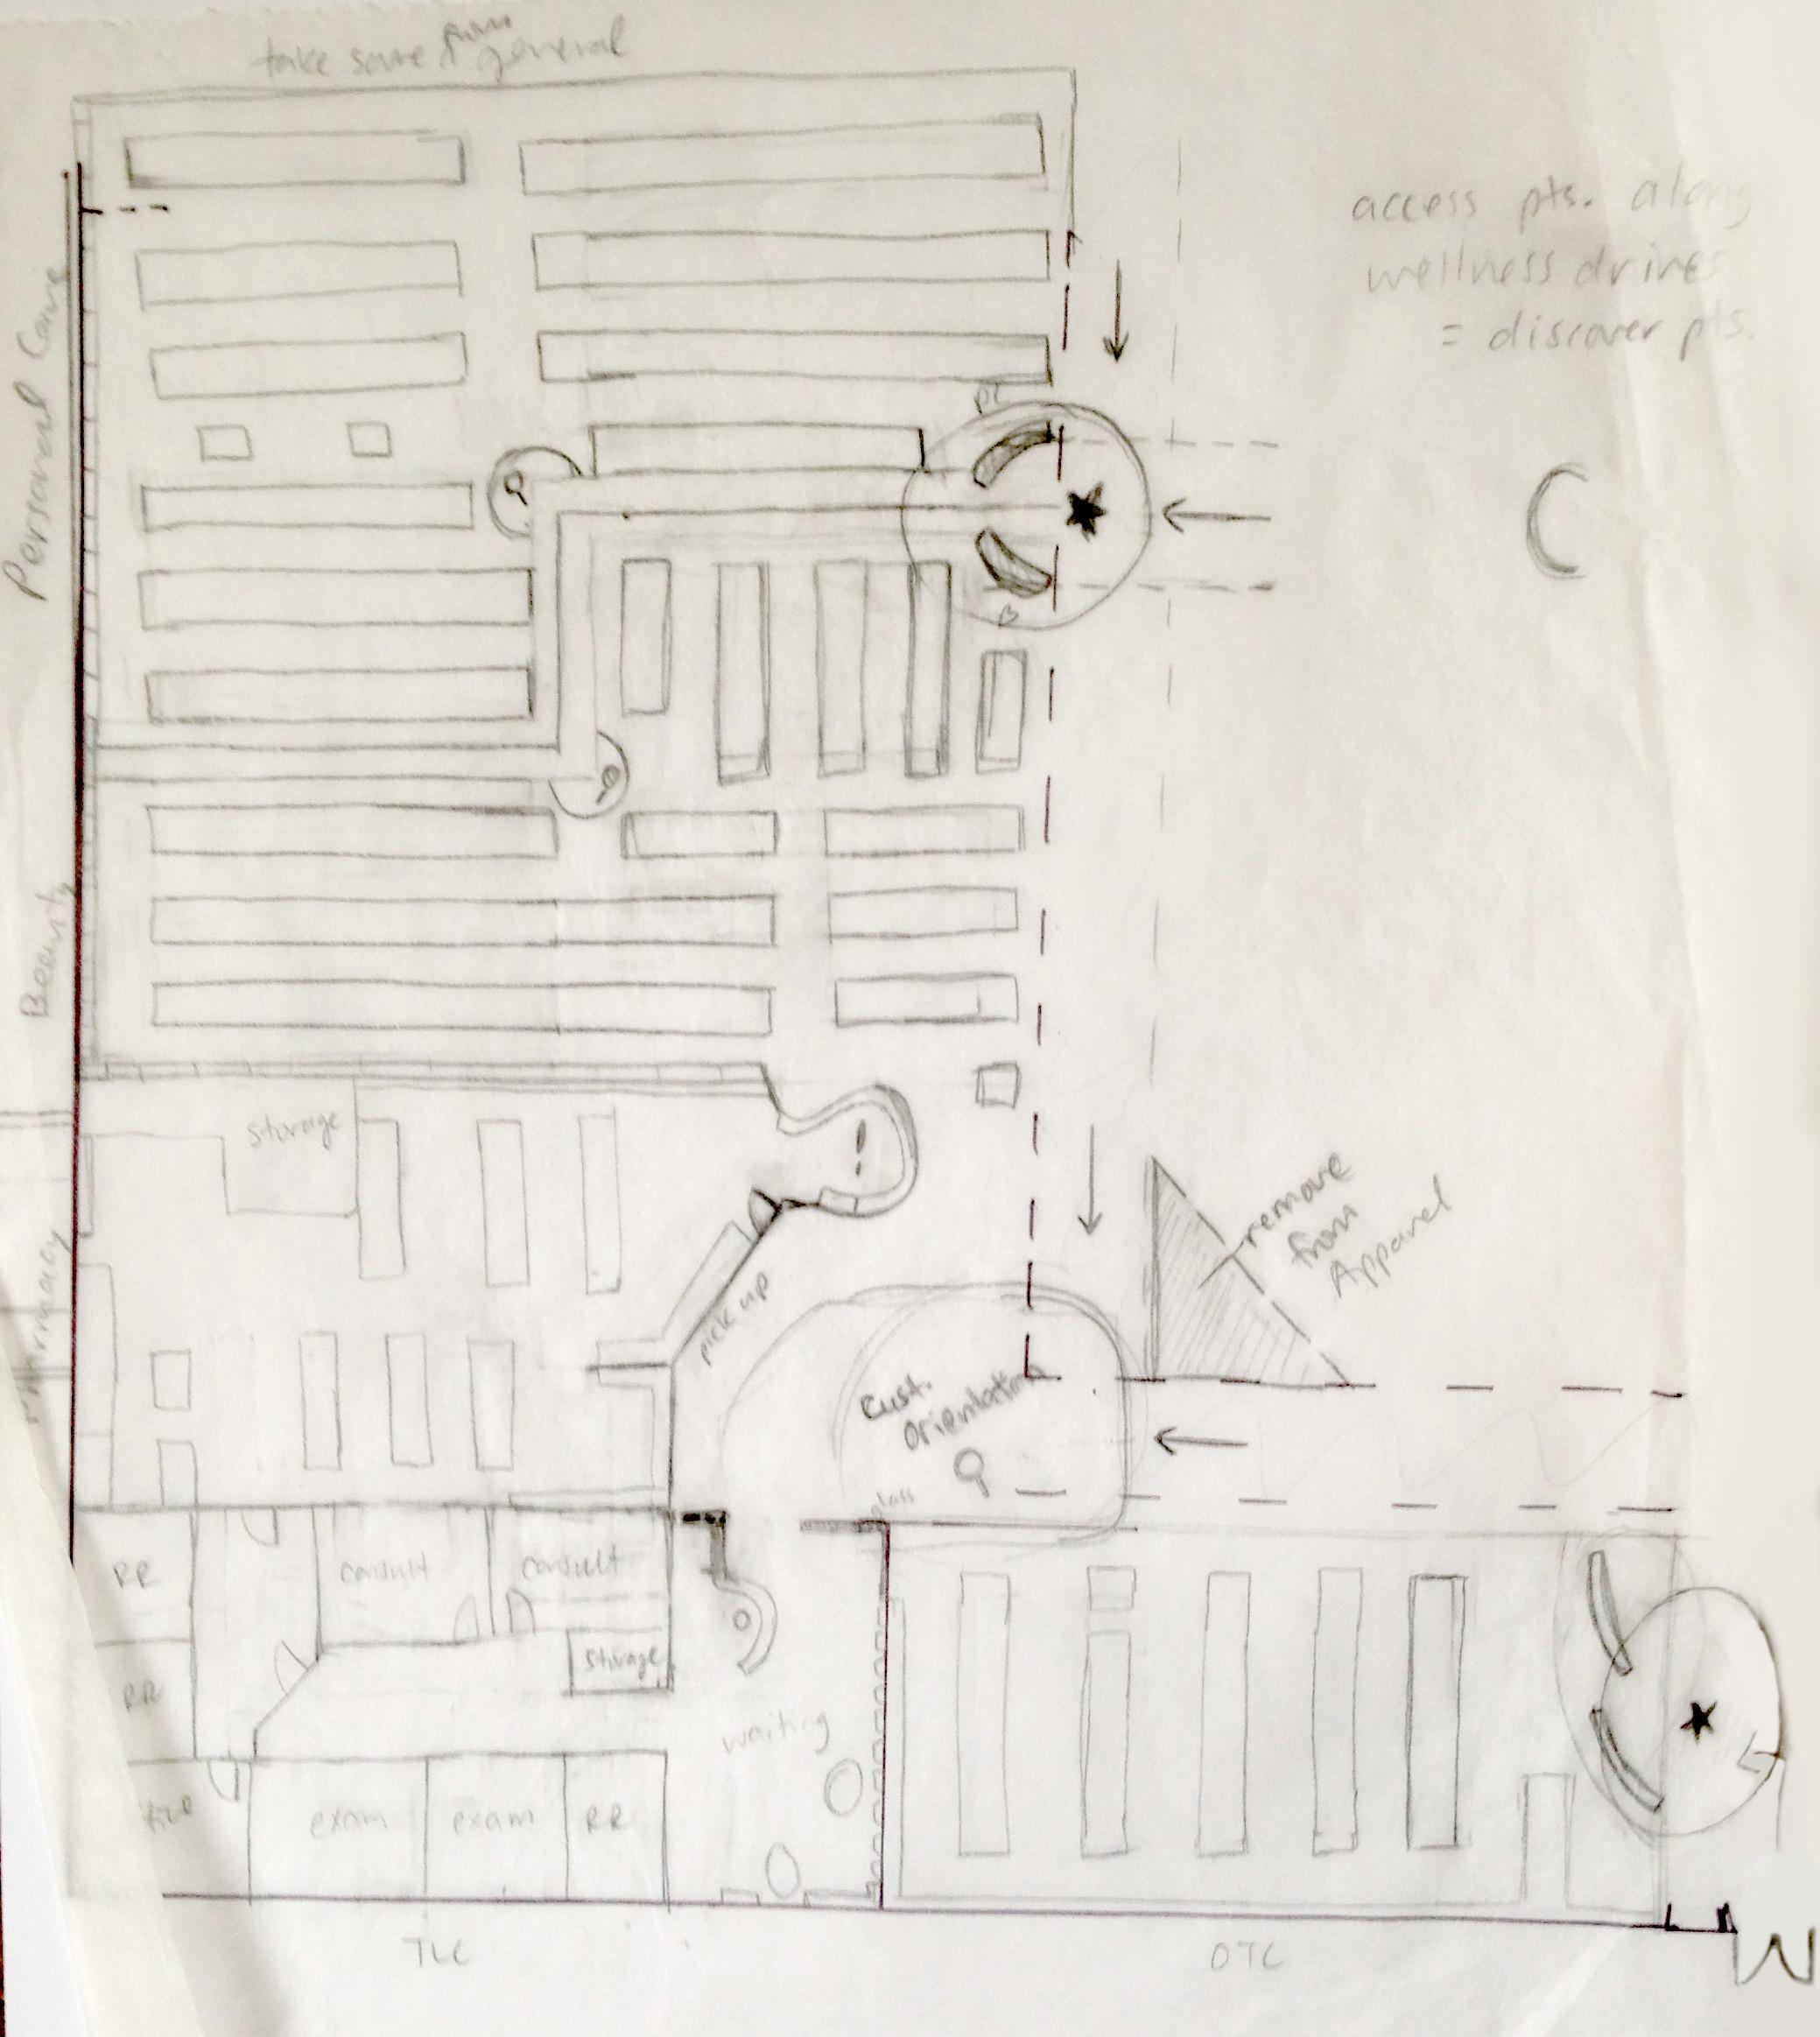 KrogerWELL Plan copy.jpg